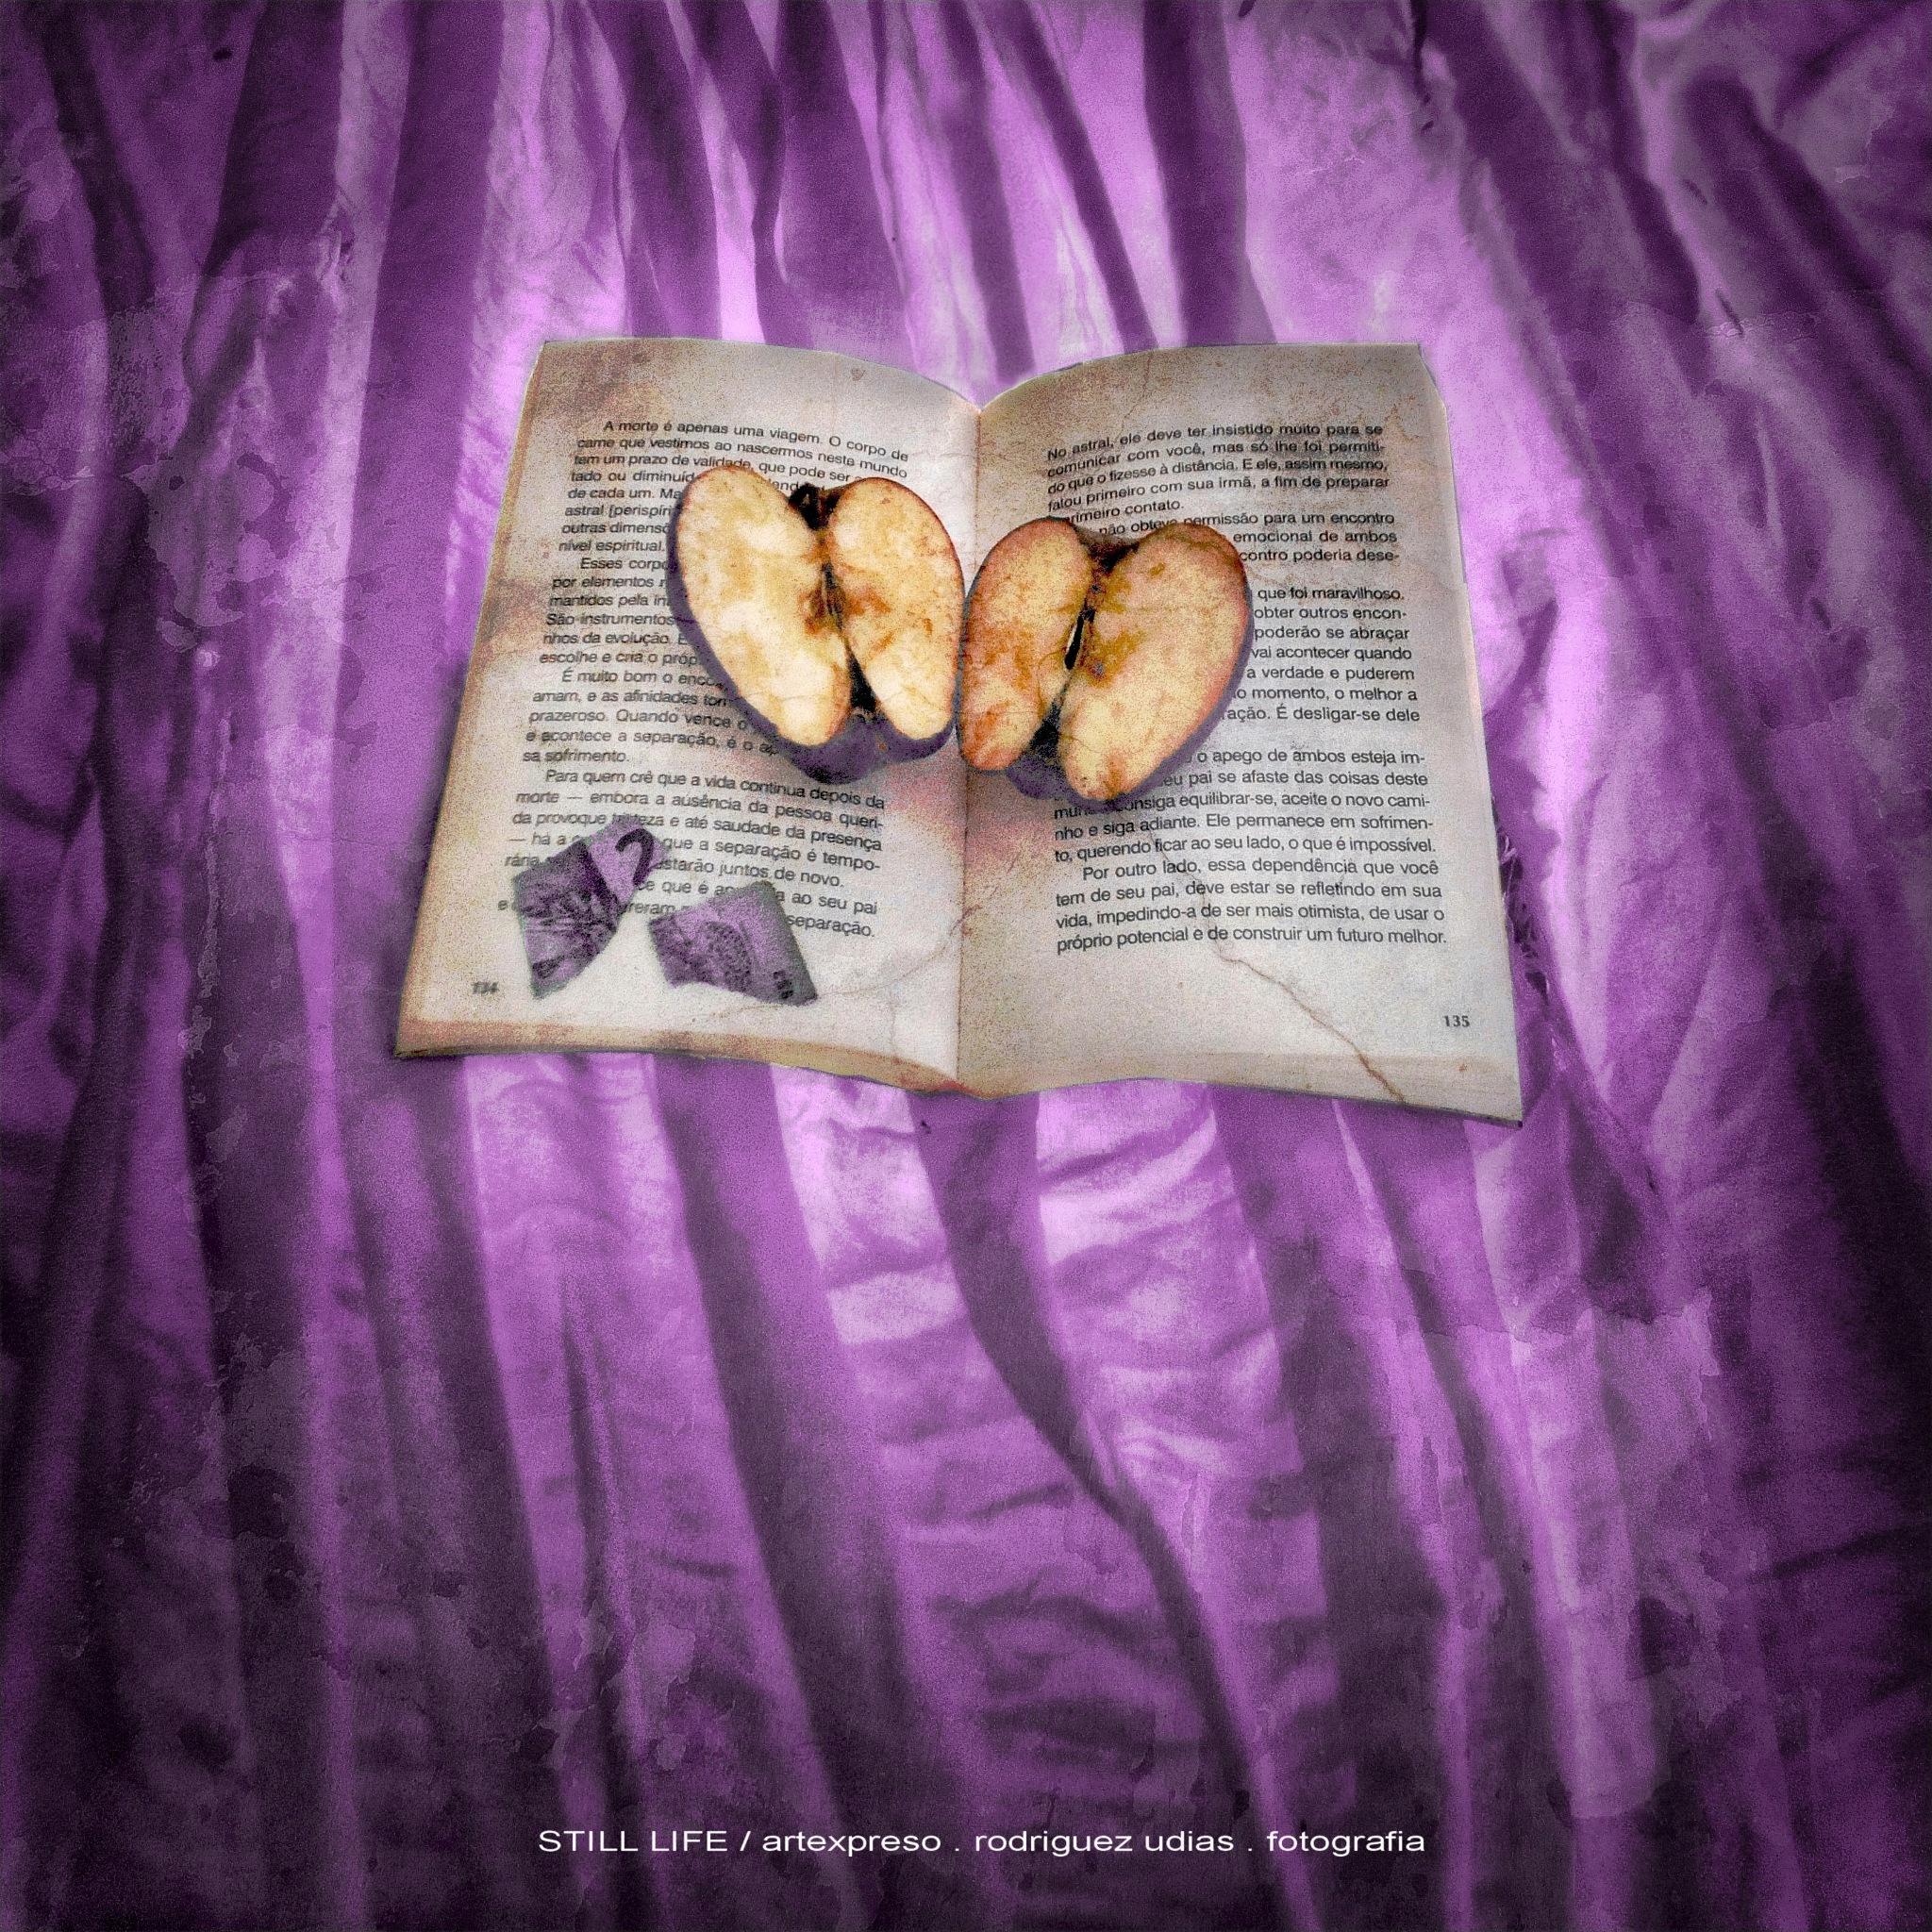 STILL LIFE . APPLE & BOOK / ARTEXPRESO 2018 by  Artexpreso